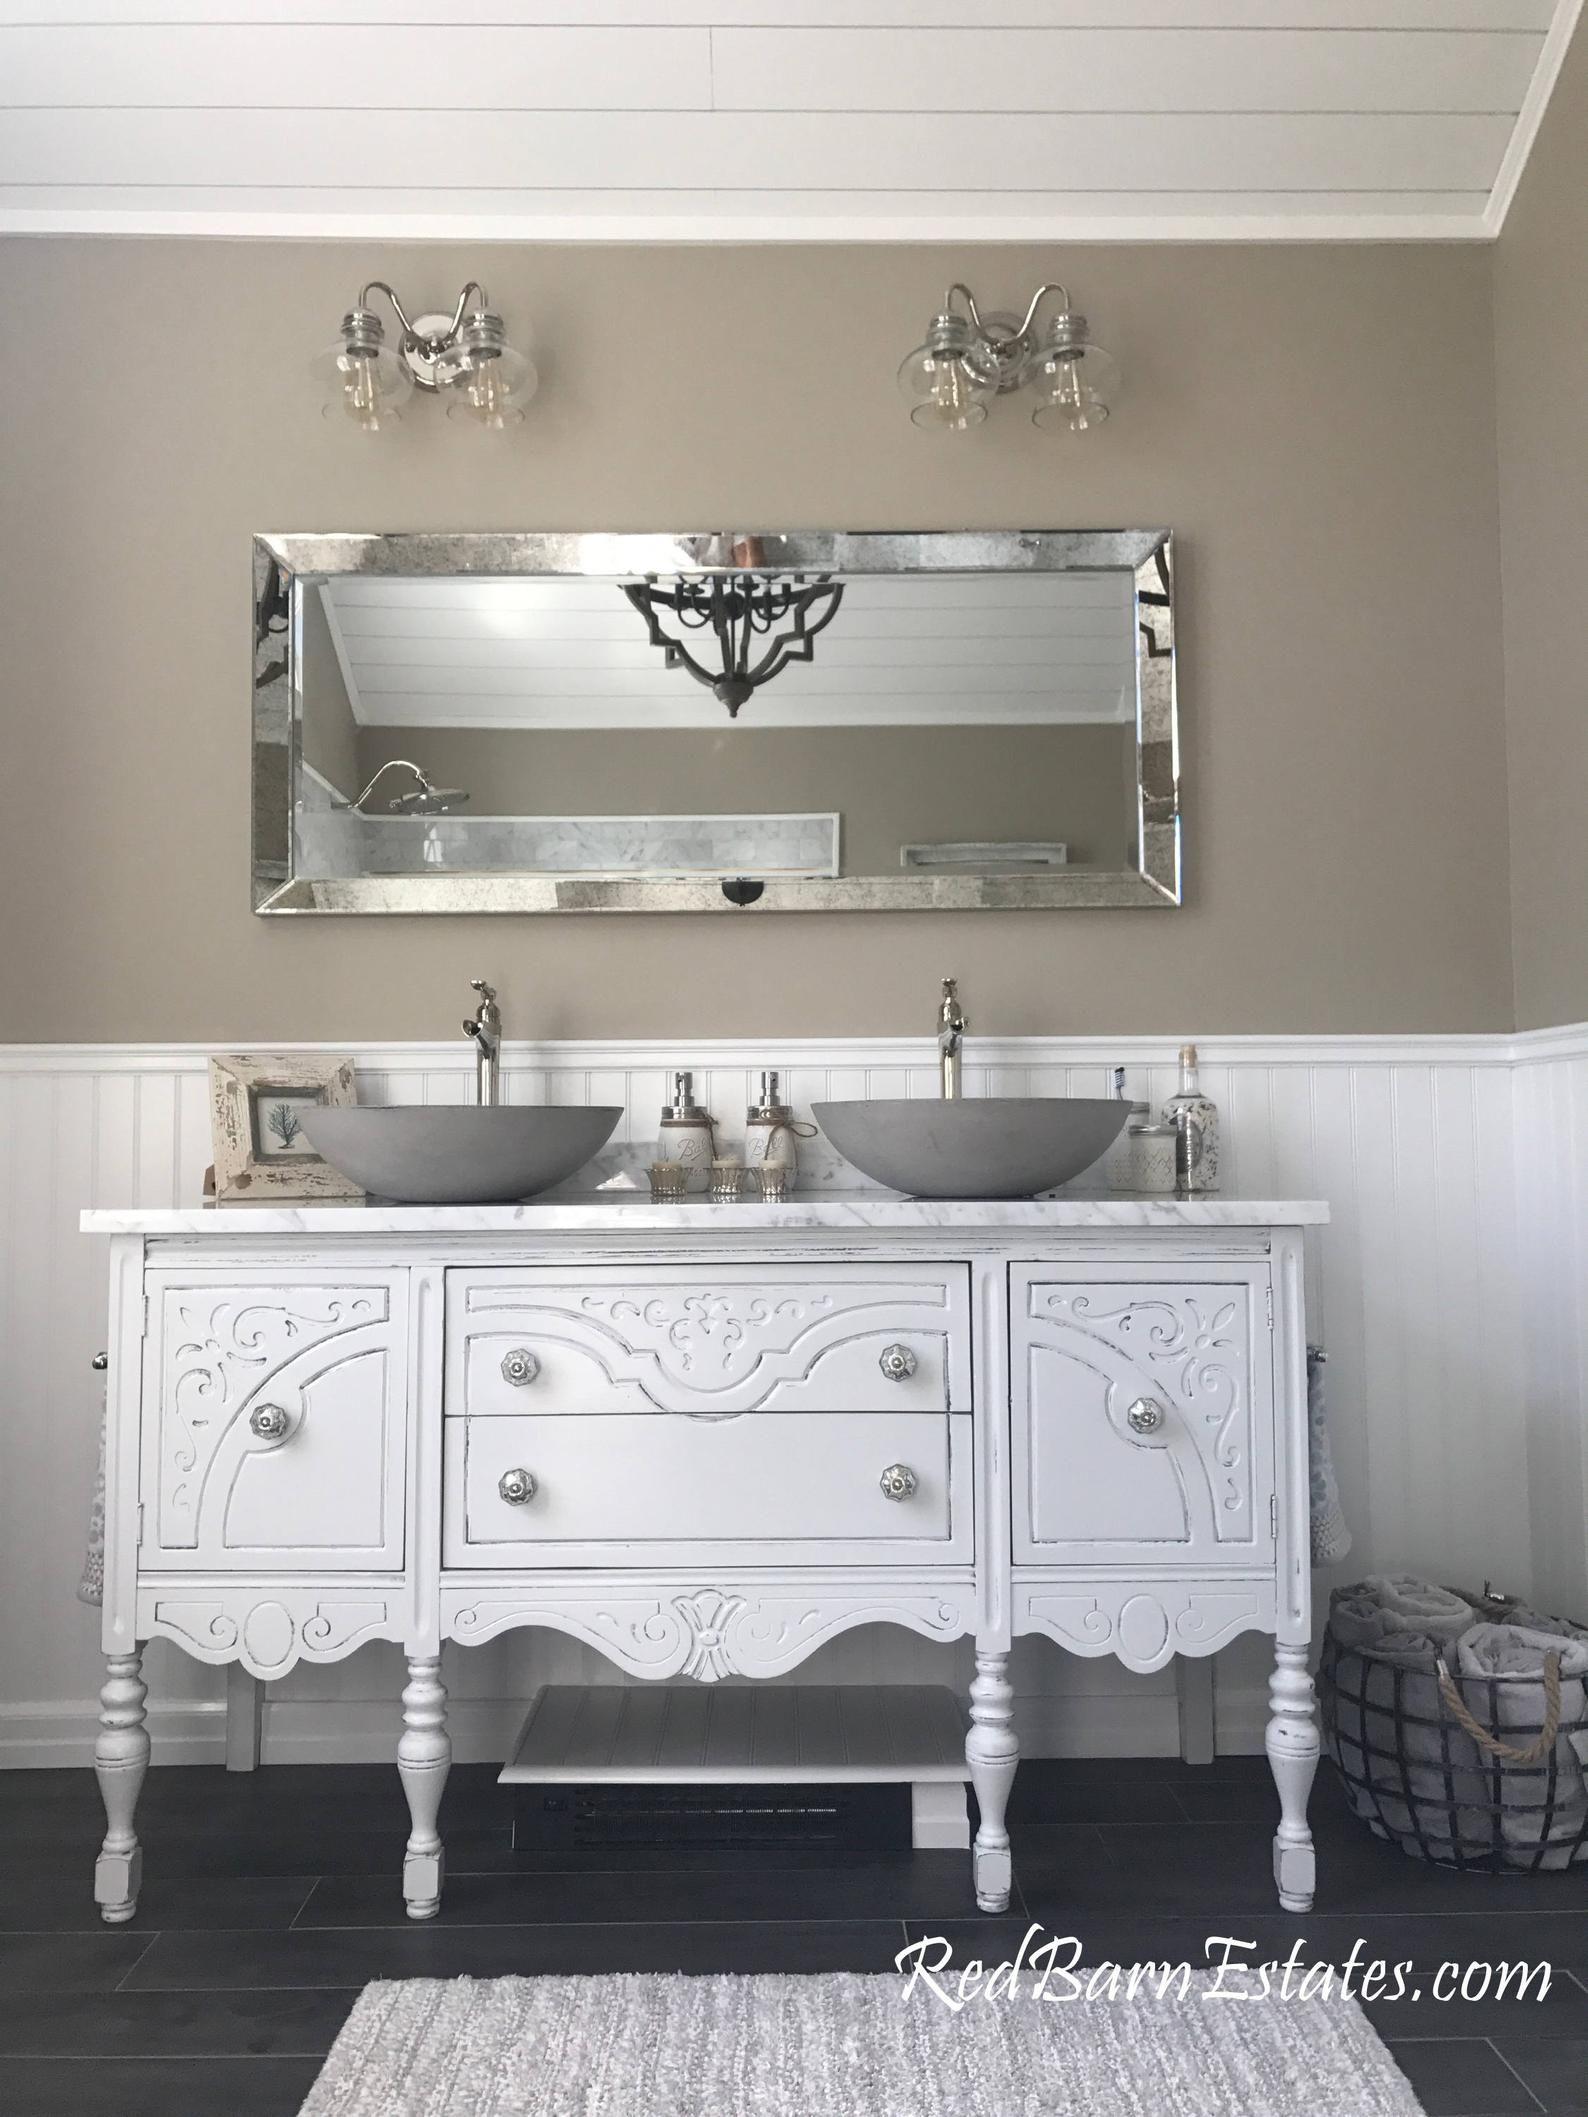 Antique Bathroom Vanity Double Or Single We Custom Convert Etsy Antique Bathroom Vanity Furniture Vanity Shabby Chic Bathroom Vanity